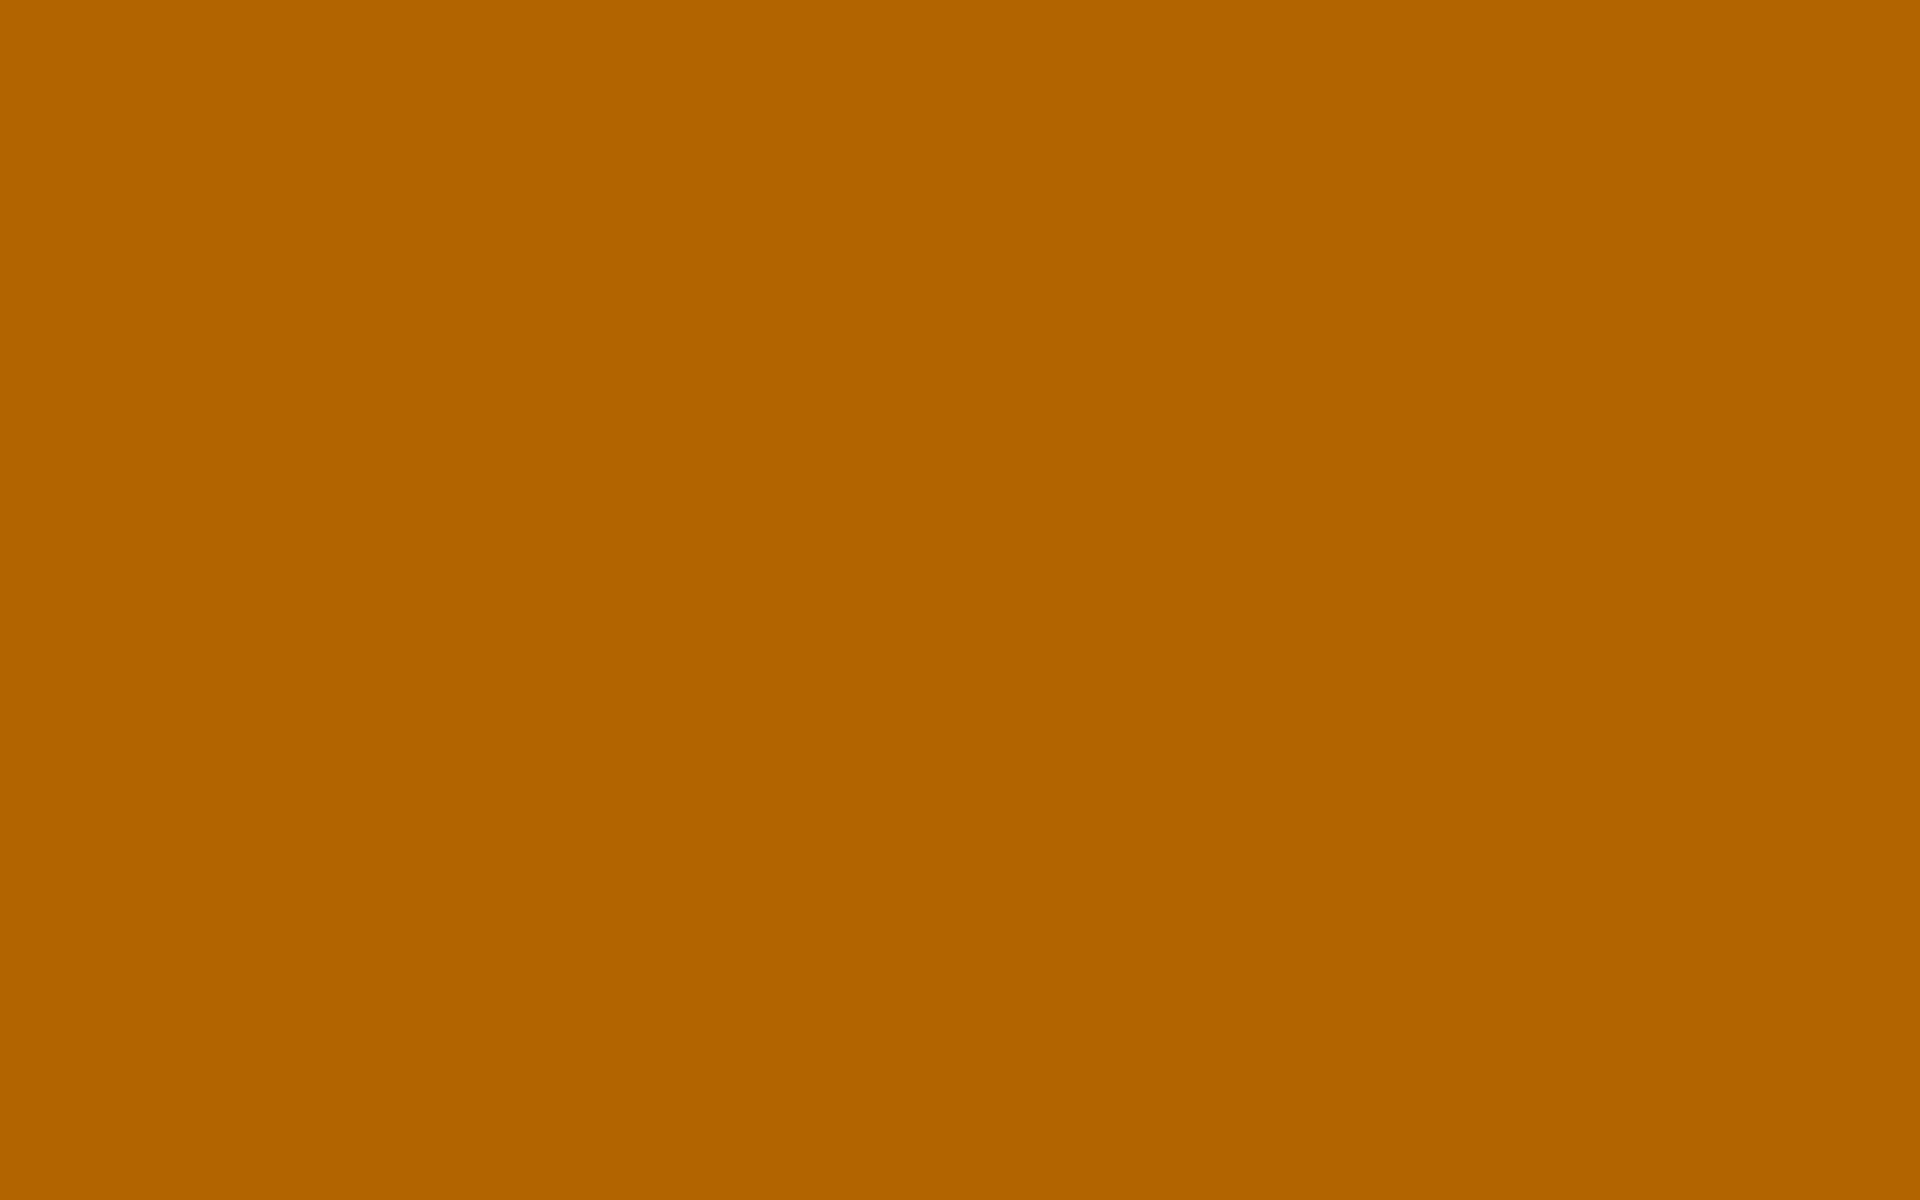 1920x1200 Ginger Solid Color Background